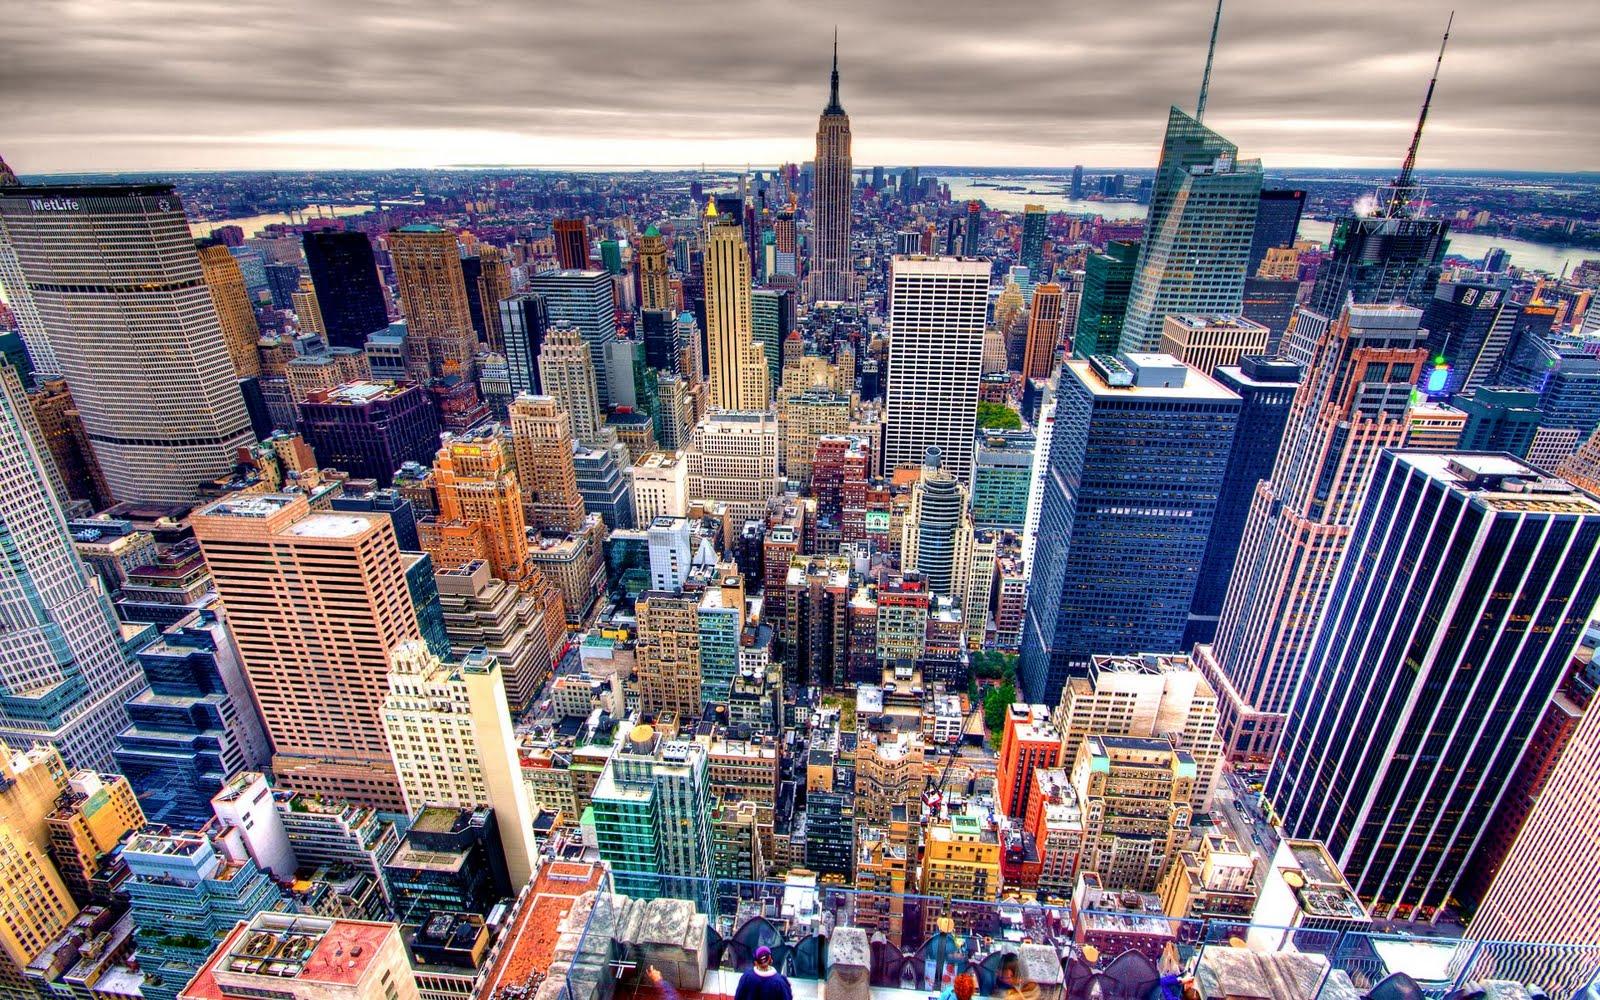 new york blog new york wallpaper pictures new york blog 1600x1000